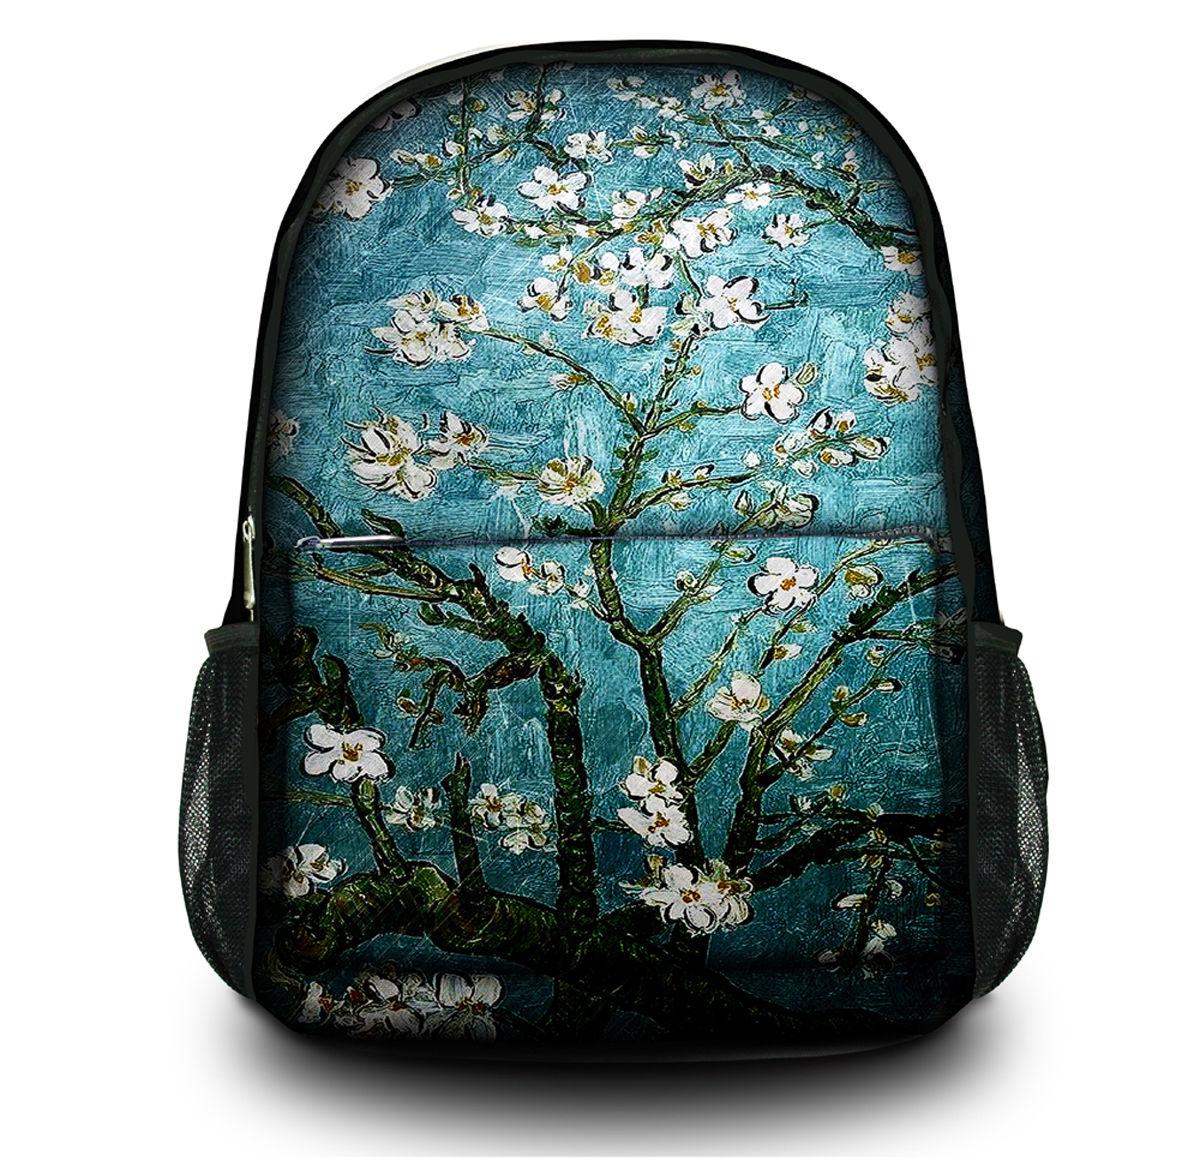 Van Gogh Print Canvas Women Backpack Large Capacity Rucksack Satchel School Bag Bookbag Laptop Bag For Teenager's Girl's настенные фотокартины van gogh fruit df 218